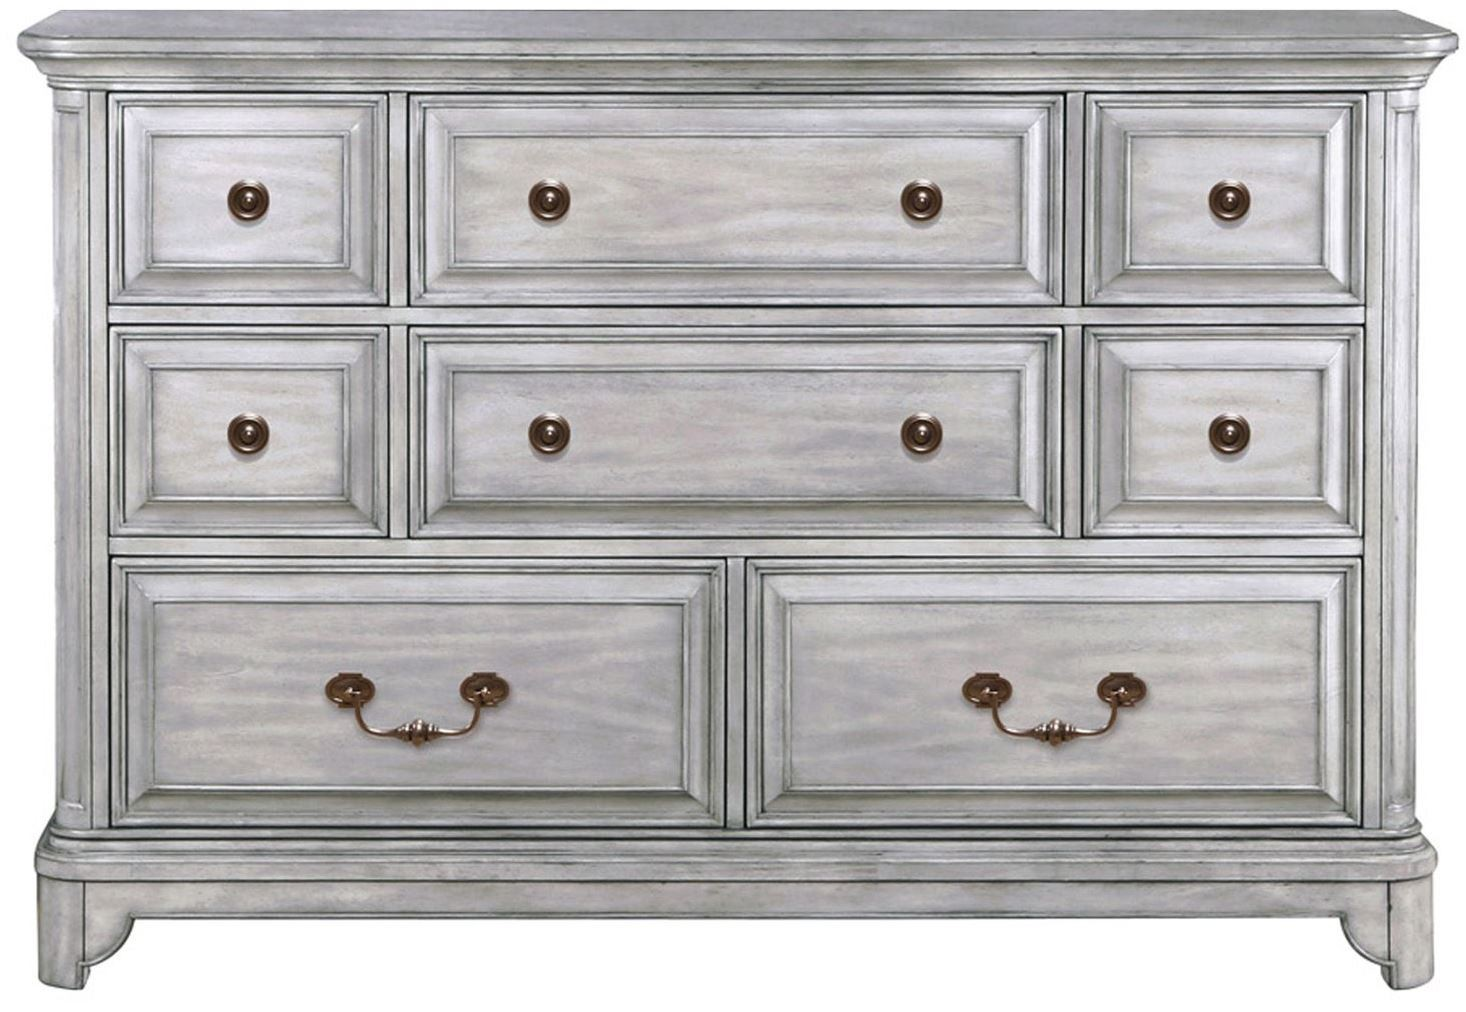 Windsor Lane Weathered Grey Wood Drawer Dresser From Magnussen Home B3341 20 Coleman Furniture